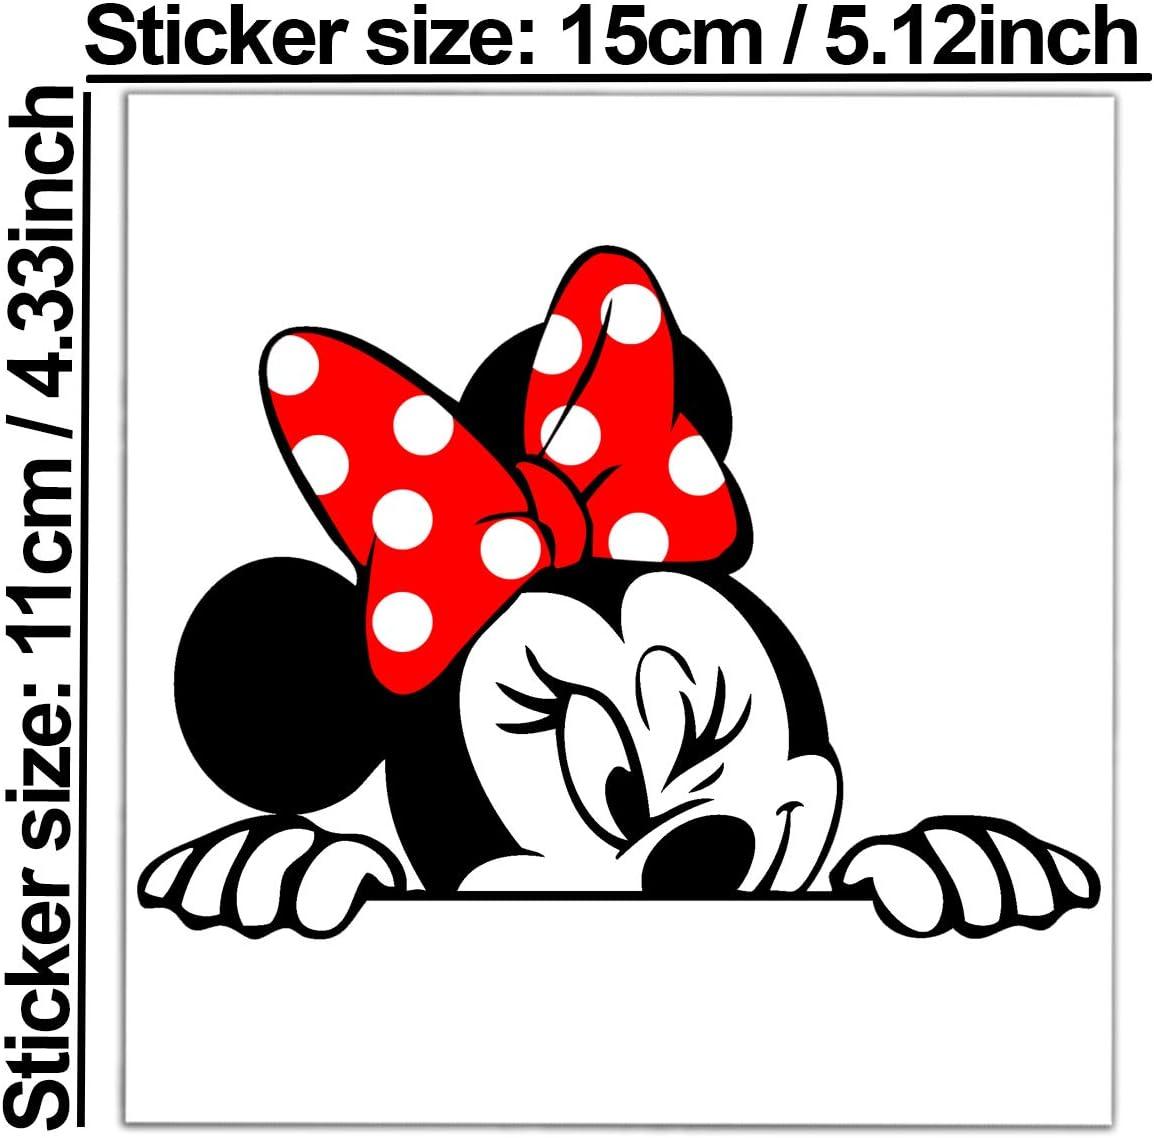 Biomar Labs 1 Stück Vinyl Lustiger Aufkleber Autoaufkleber Minnie Mouse Minni Maus Funny Sticker Auto Motorrad Fenster Fahrrad Tuning B 246 Auto